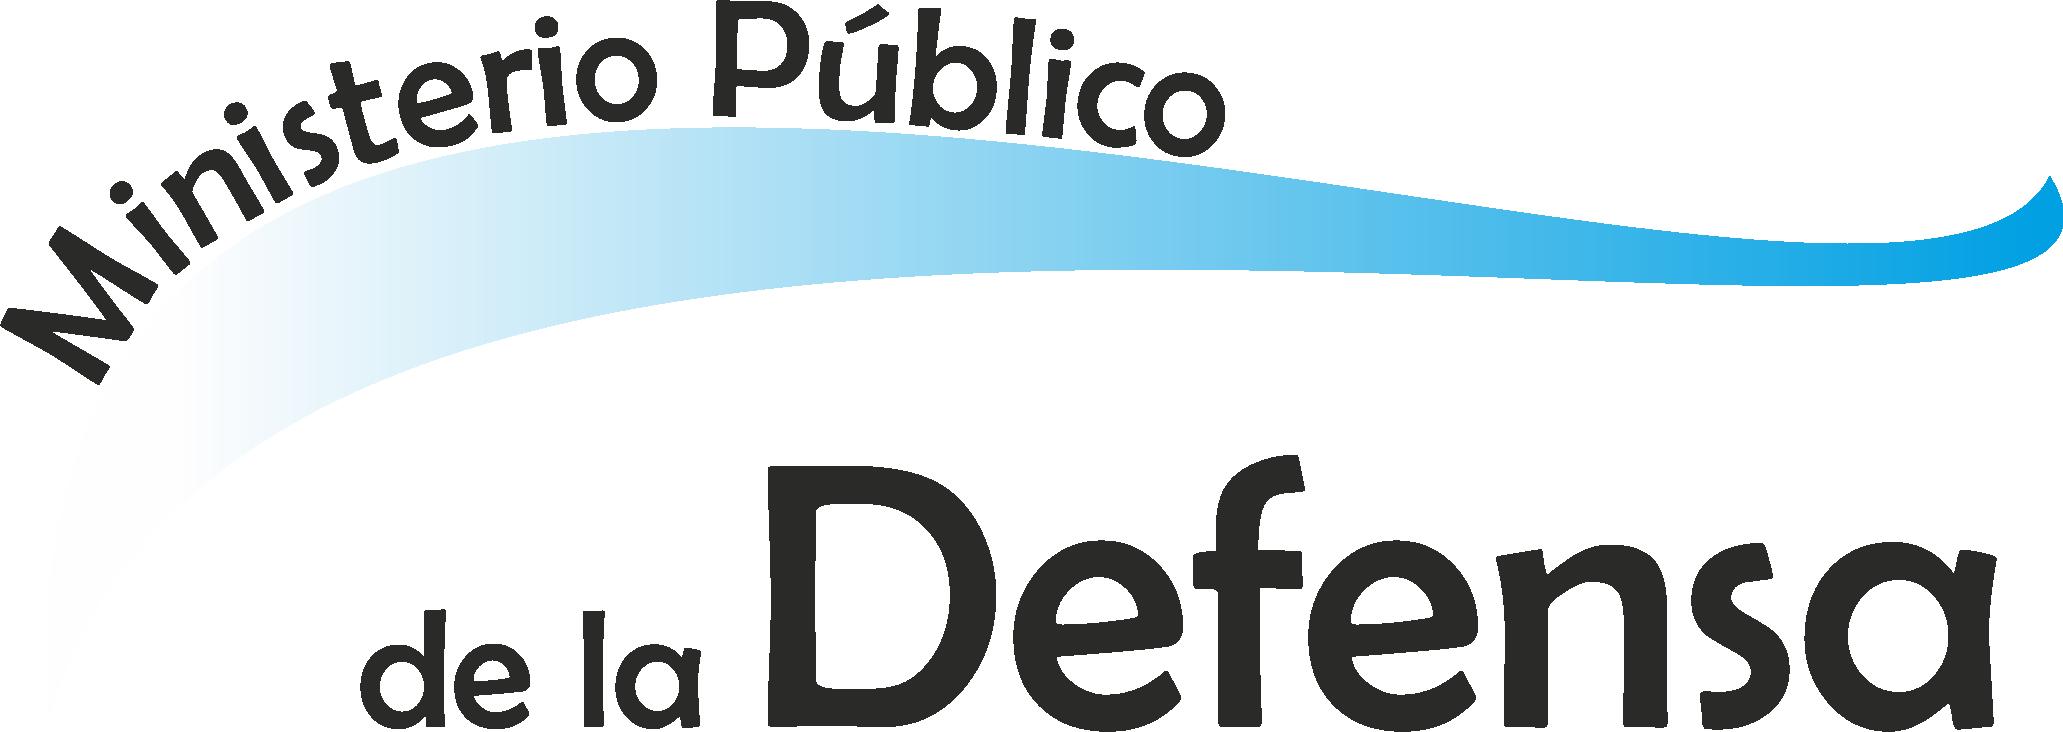 Ministerio Público De La Defensa De Argentina Wikipedia